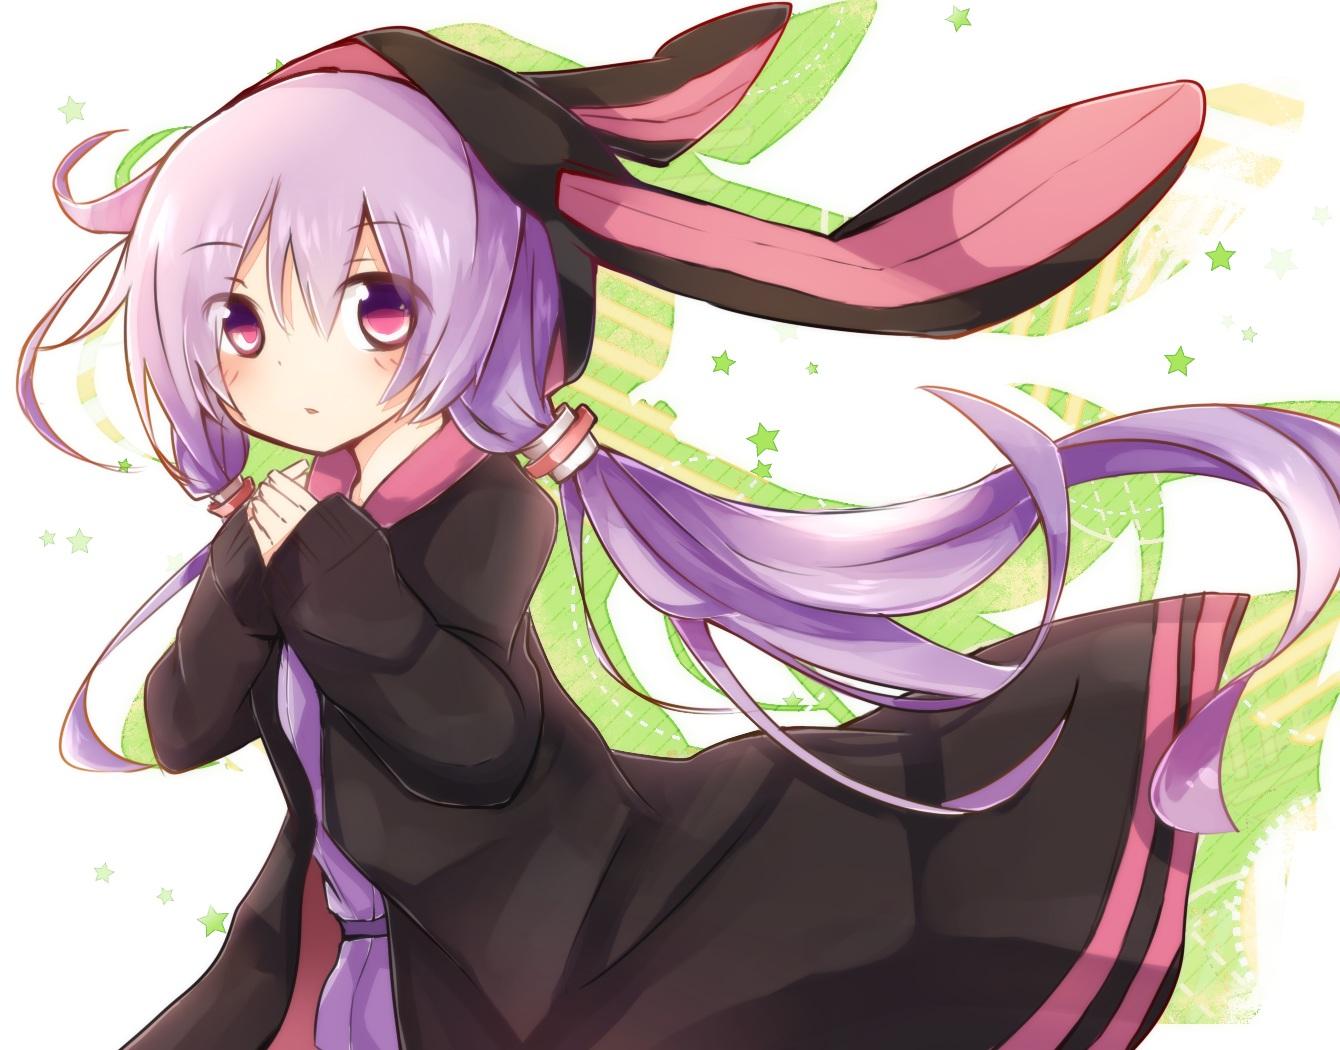 hoodie long_hair purple_eyes purple_hair tosura-ayato vocaloid voiceroid yuzuki_yukari